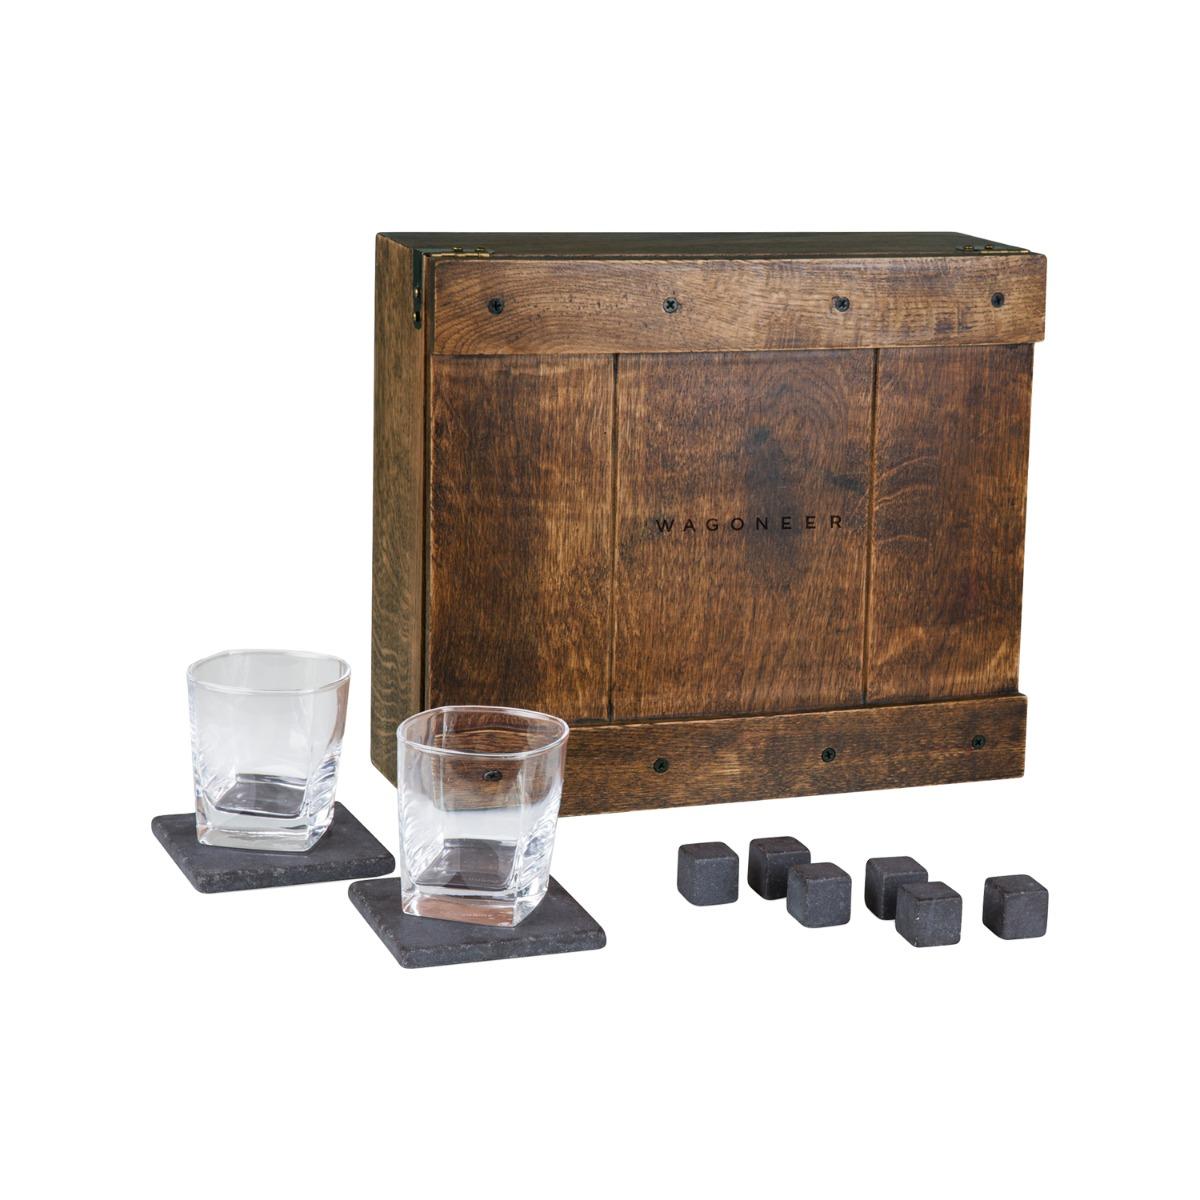 Wagoneer Whiskey Box Set